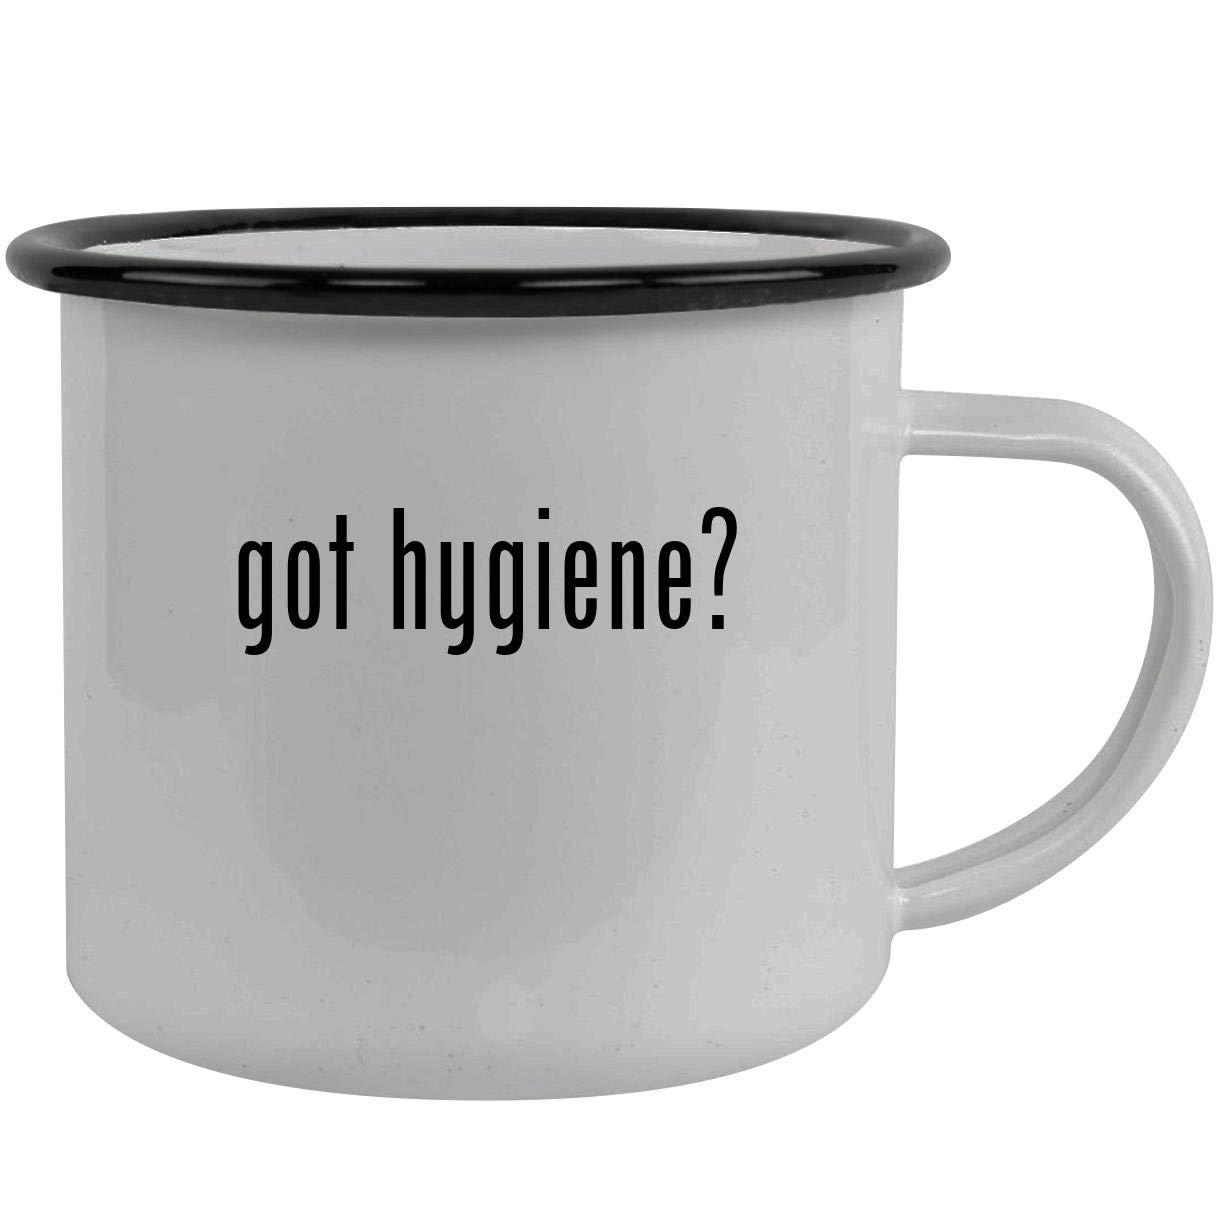 got hygiene? - Stainless Steel 12oz Camping Mug, Black